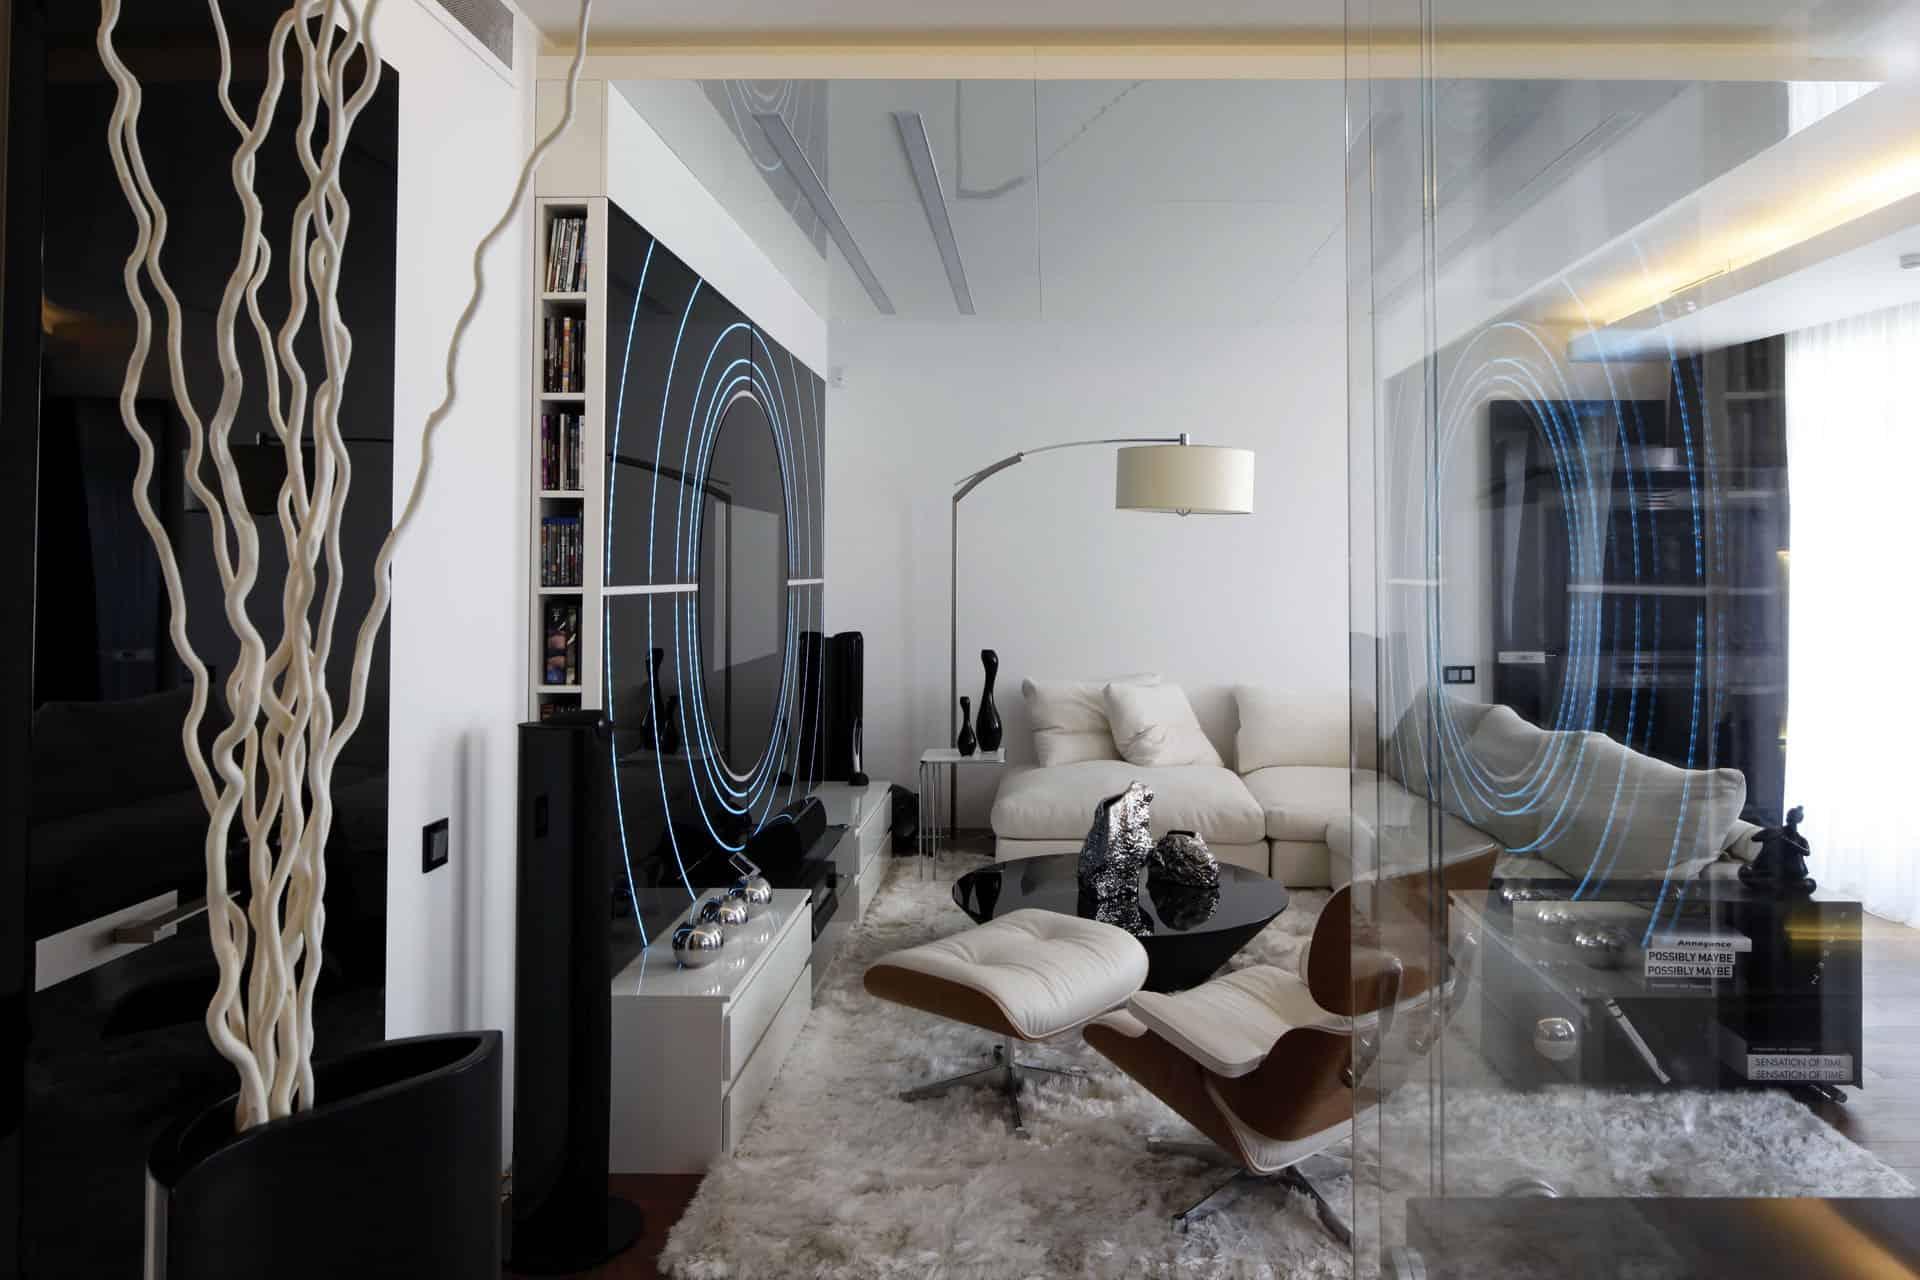 & Fantasy Island Apartment in Moscow by Gemotrix Design